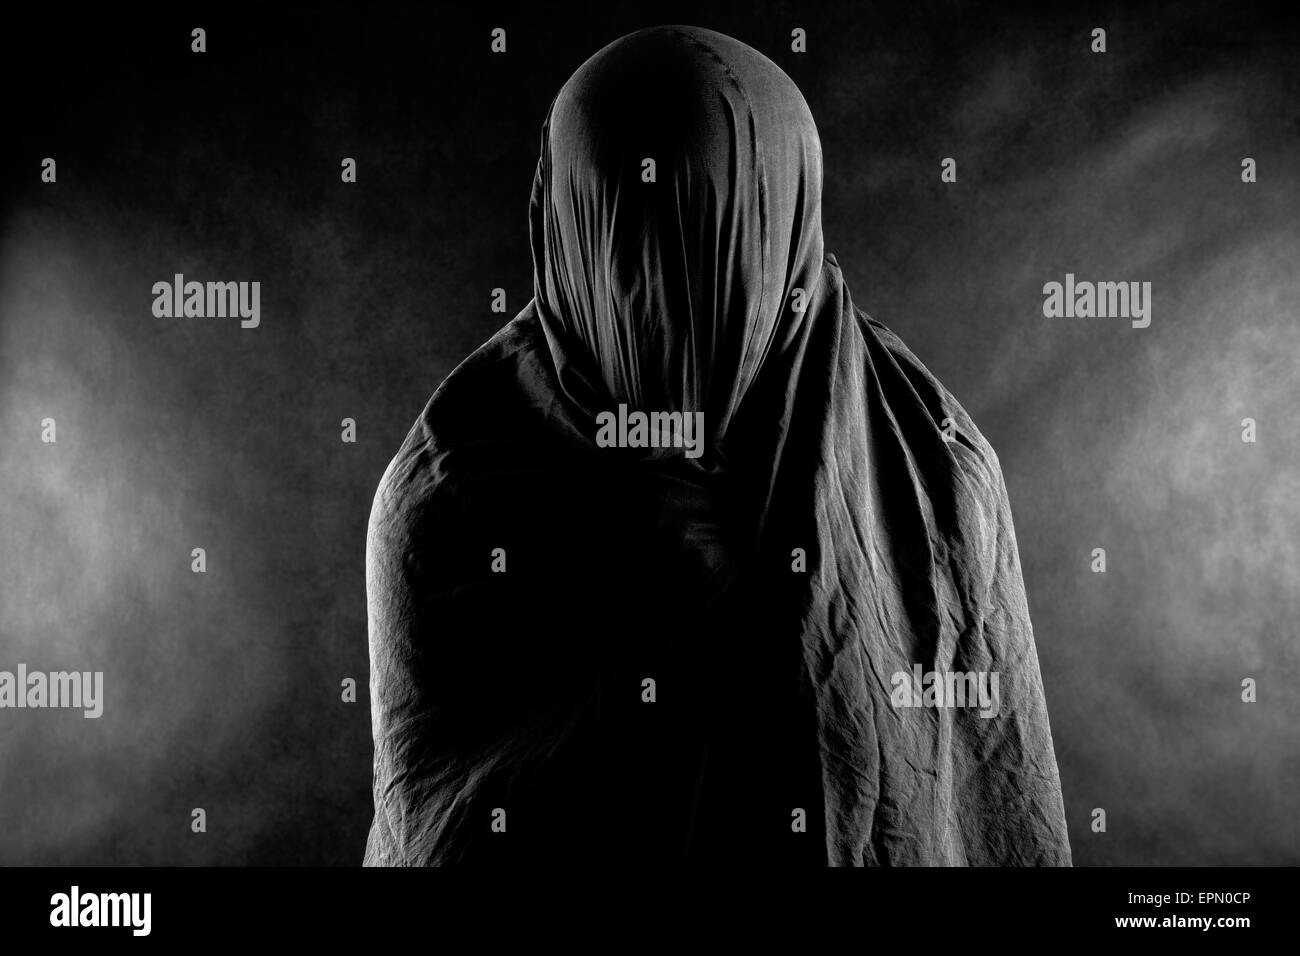 Ghost in the dark - Stock Image